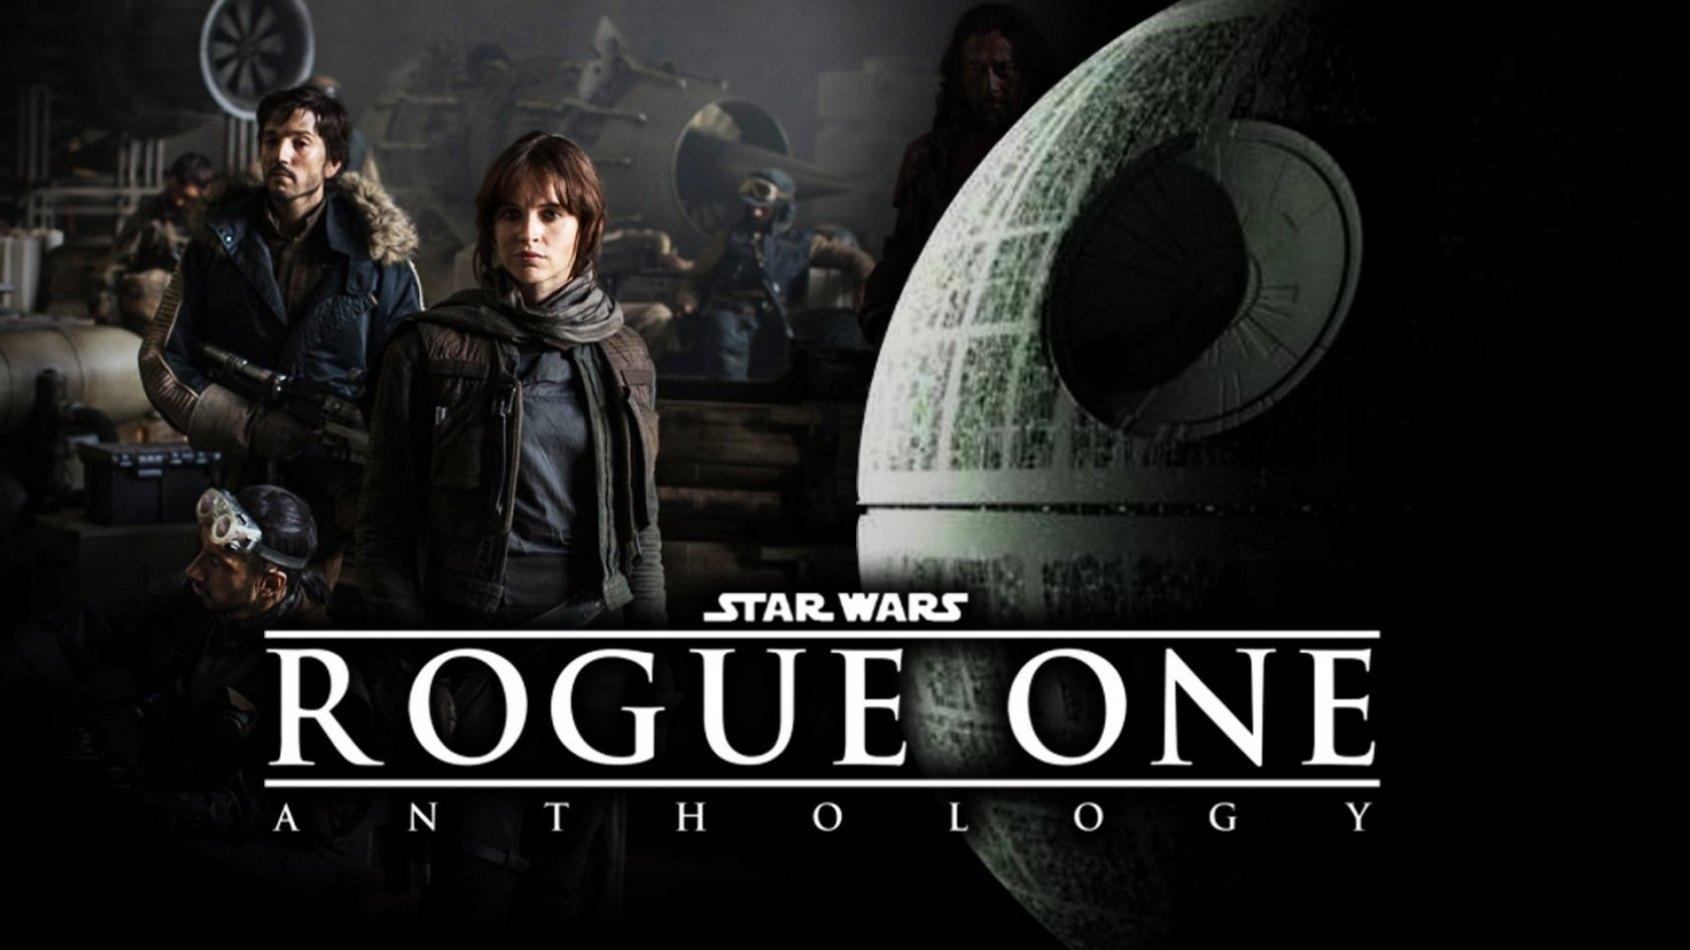 Un des personnages de la saga principale va apparaître dans Rogue One